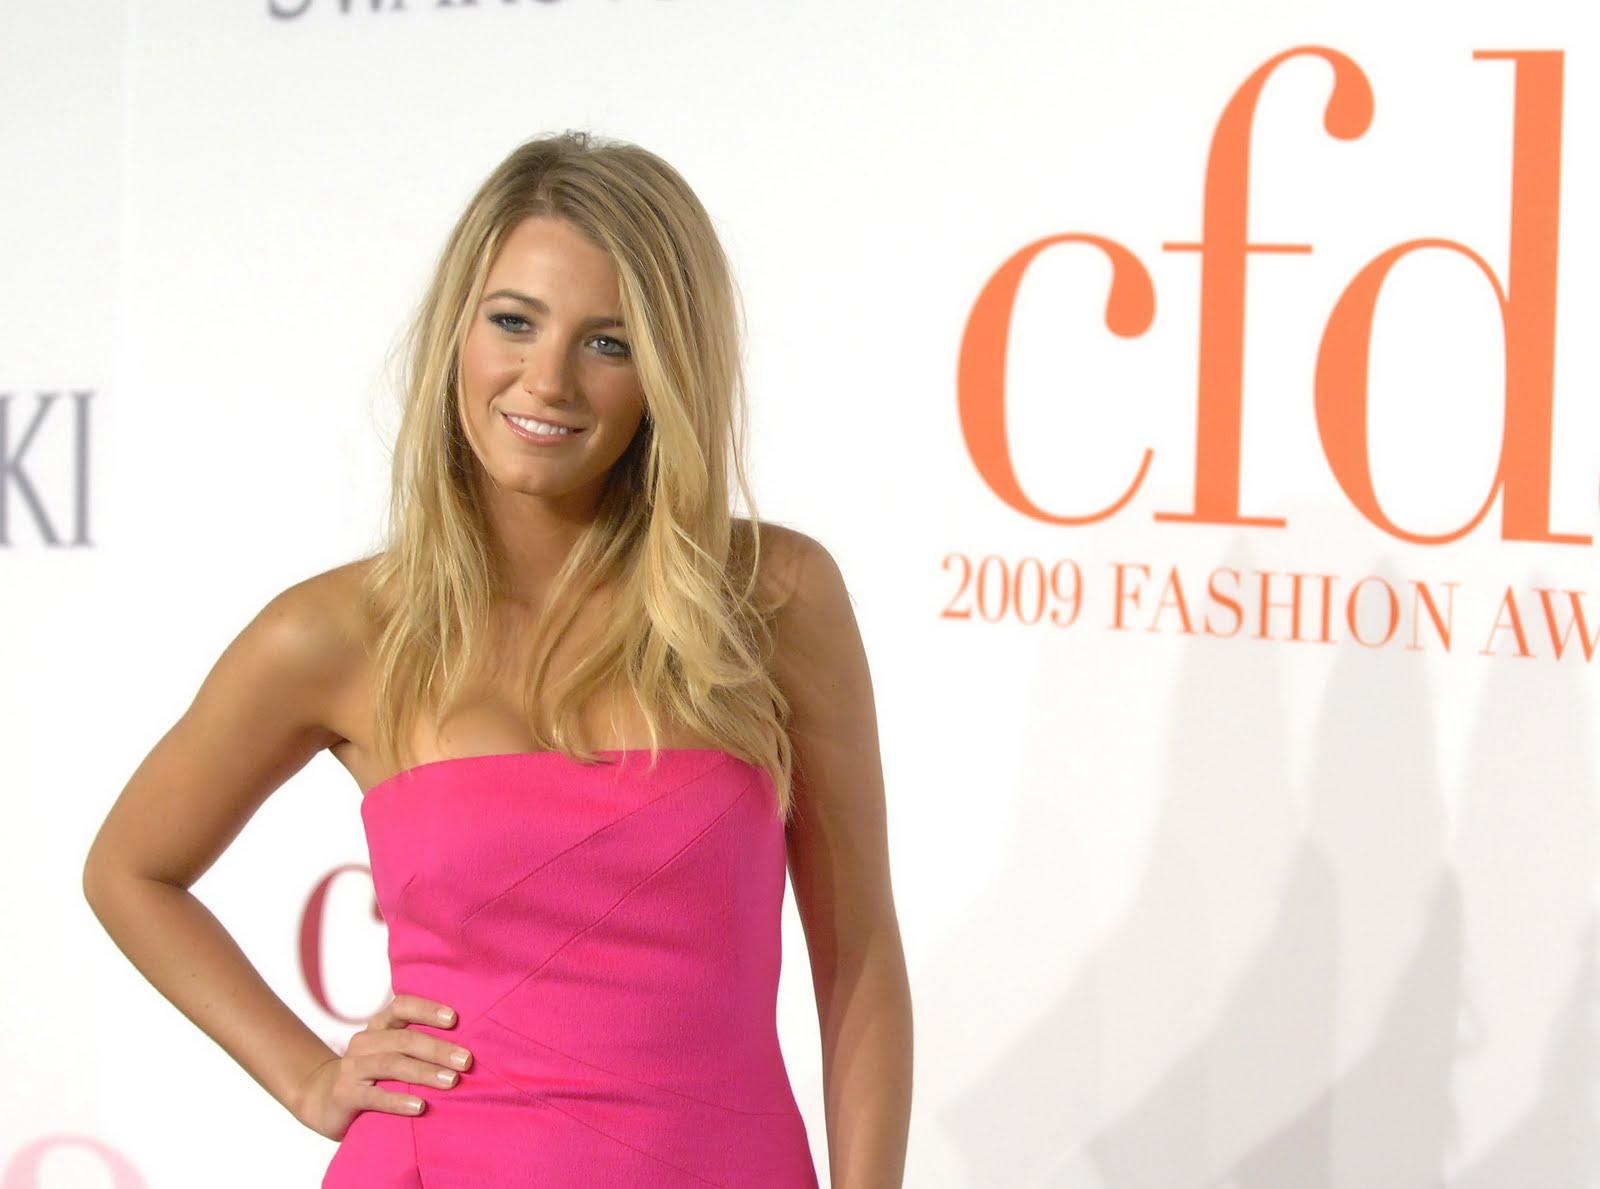 http://4.bp.blogspot.com/-jRMV5iG1VFQ/TgYY_W9-lqI/AAAAAAAACUU/WytLibxjDew/s1600/Blake_Lively_hot_pink_beauty.jpg